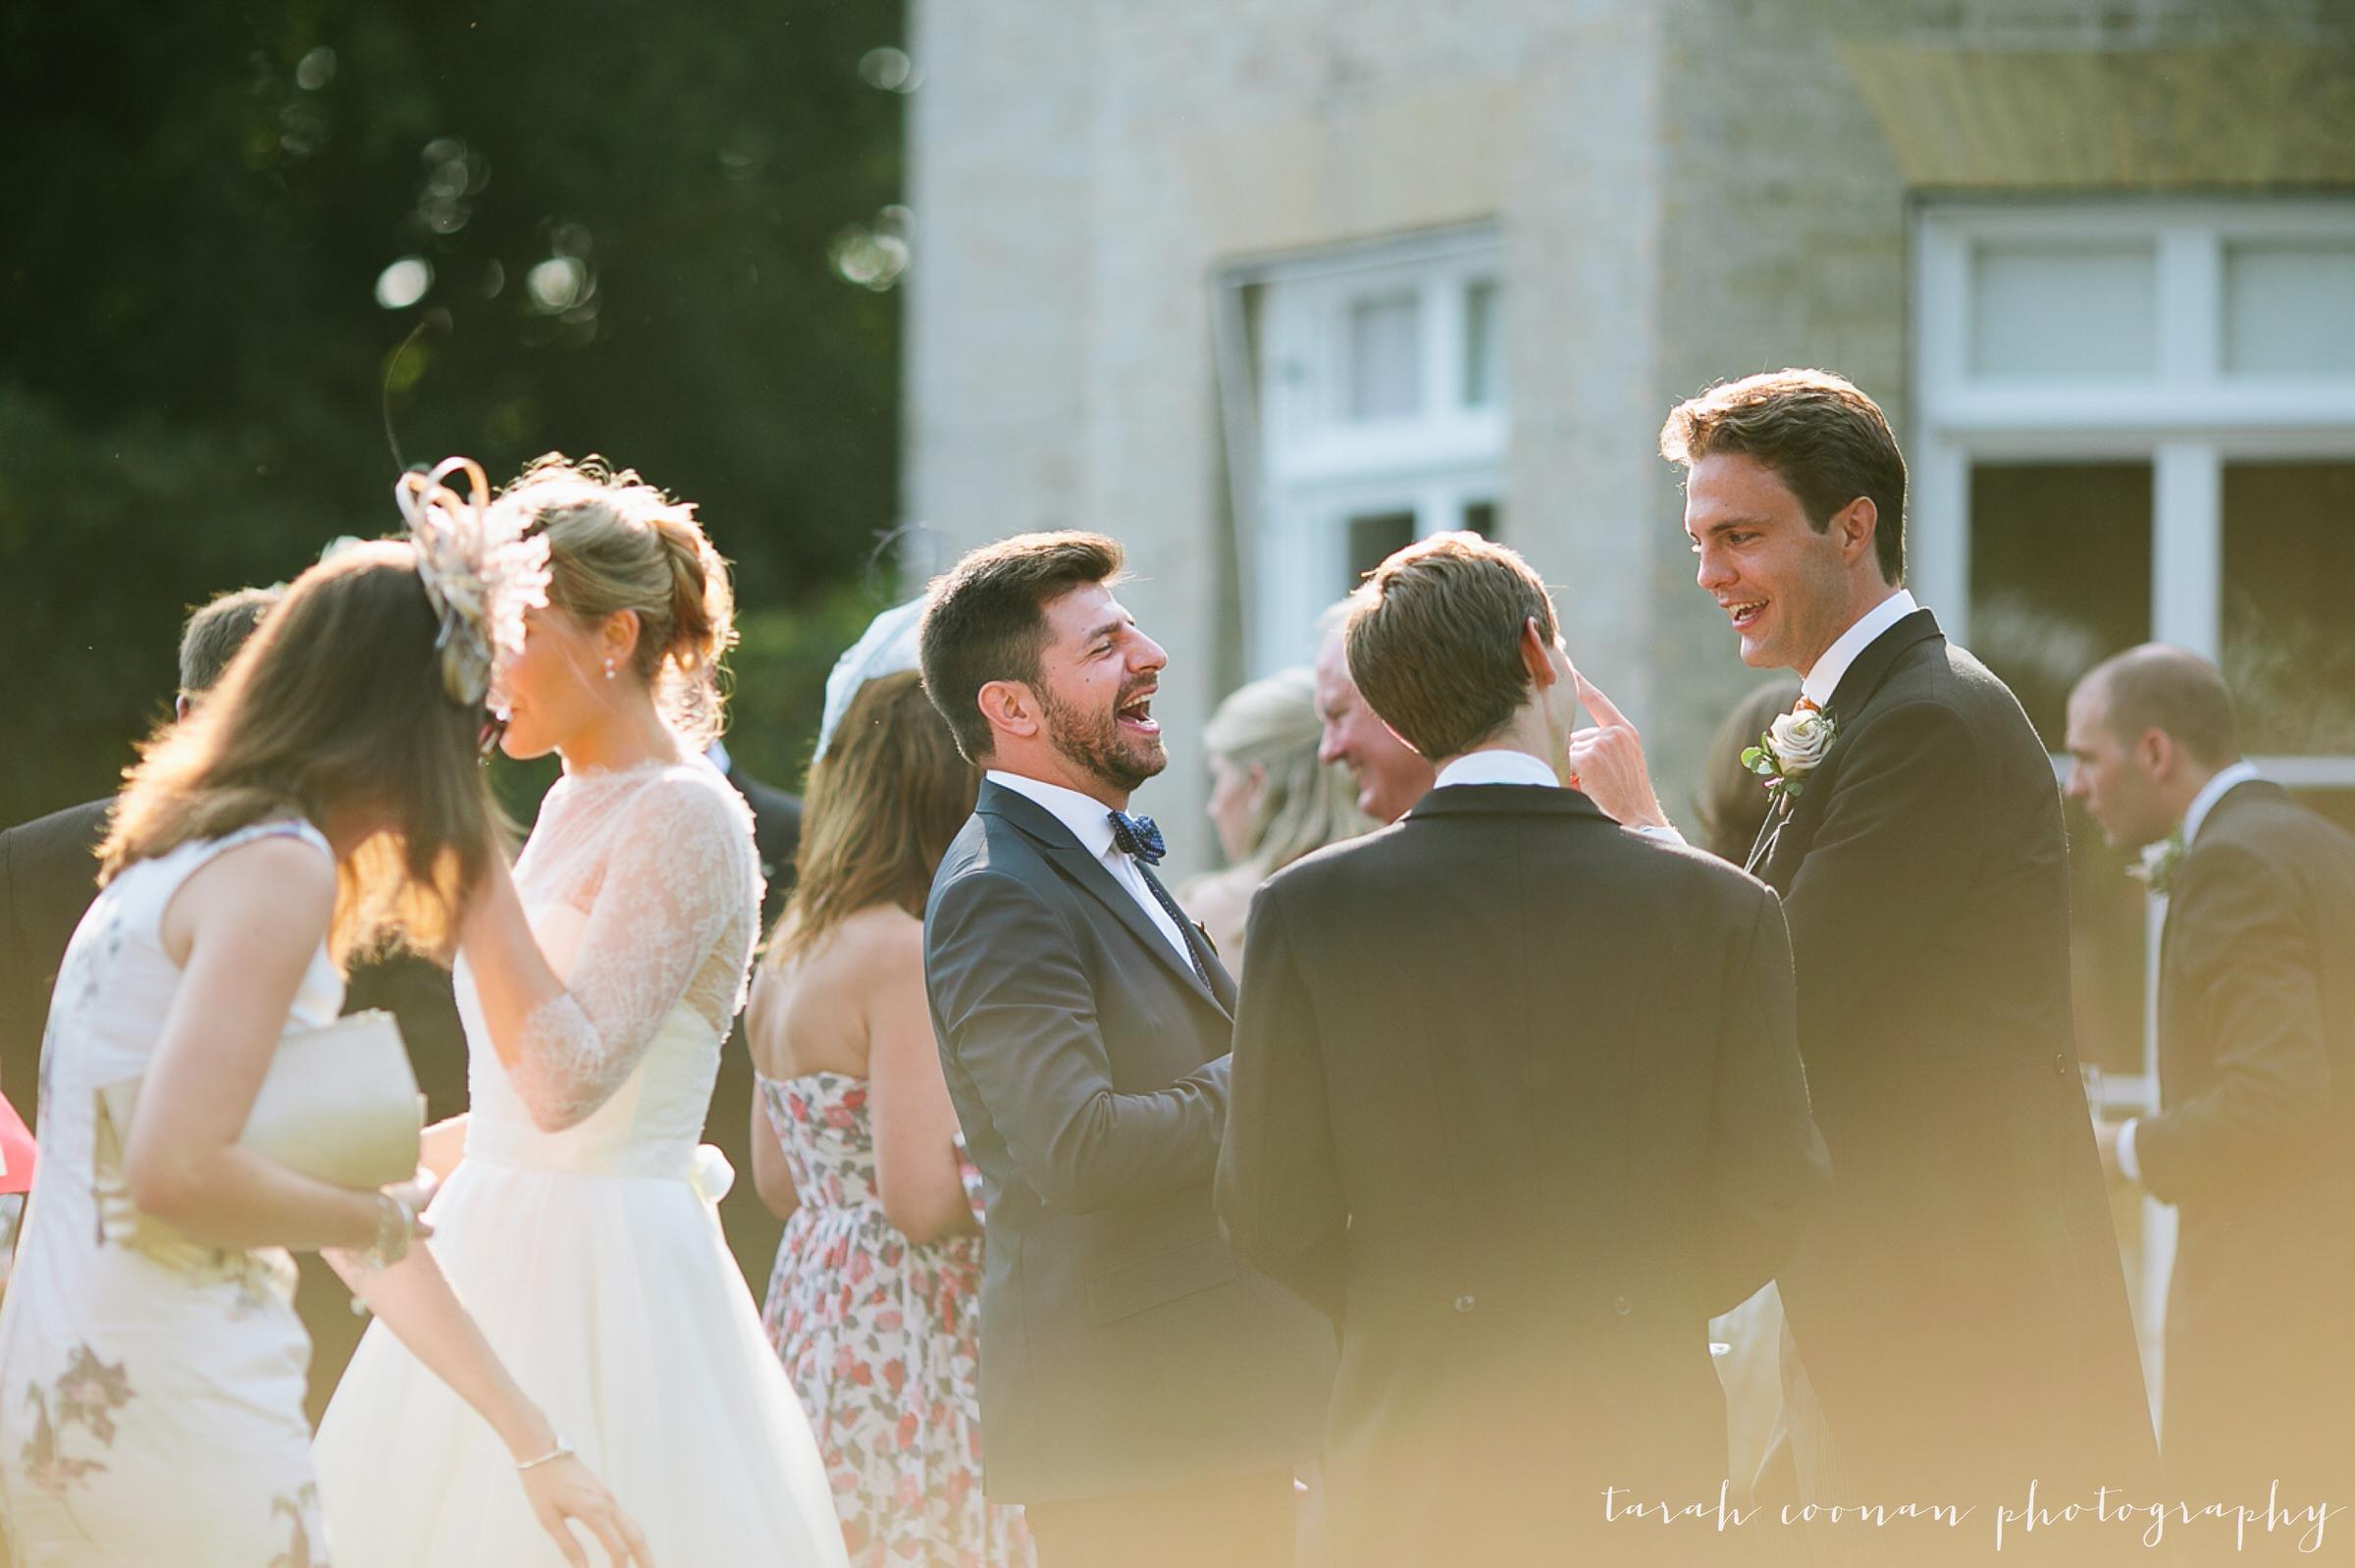 brighton-wedding-photographer45